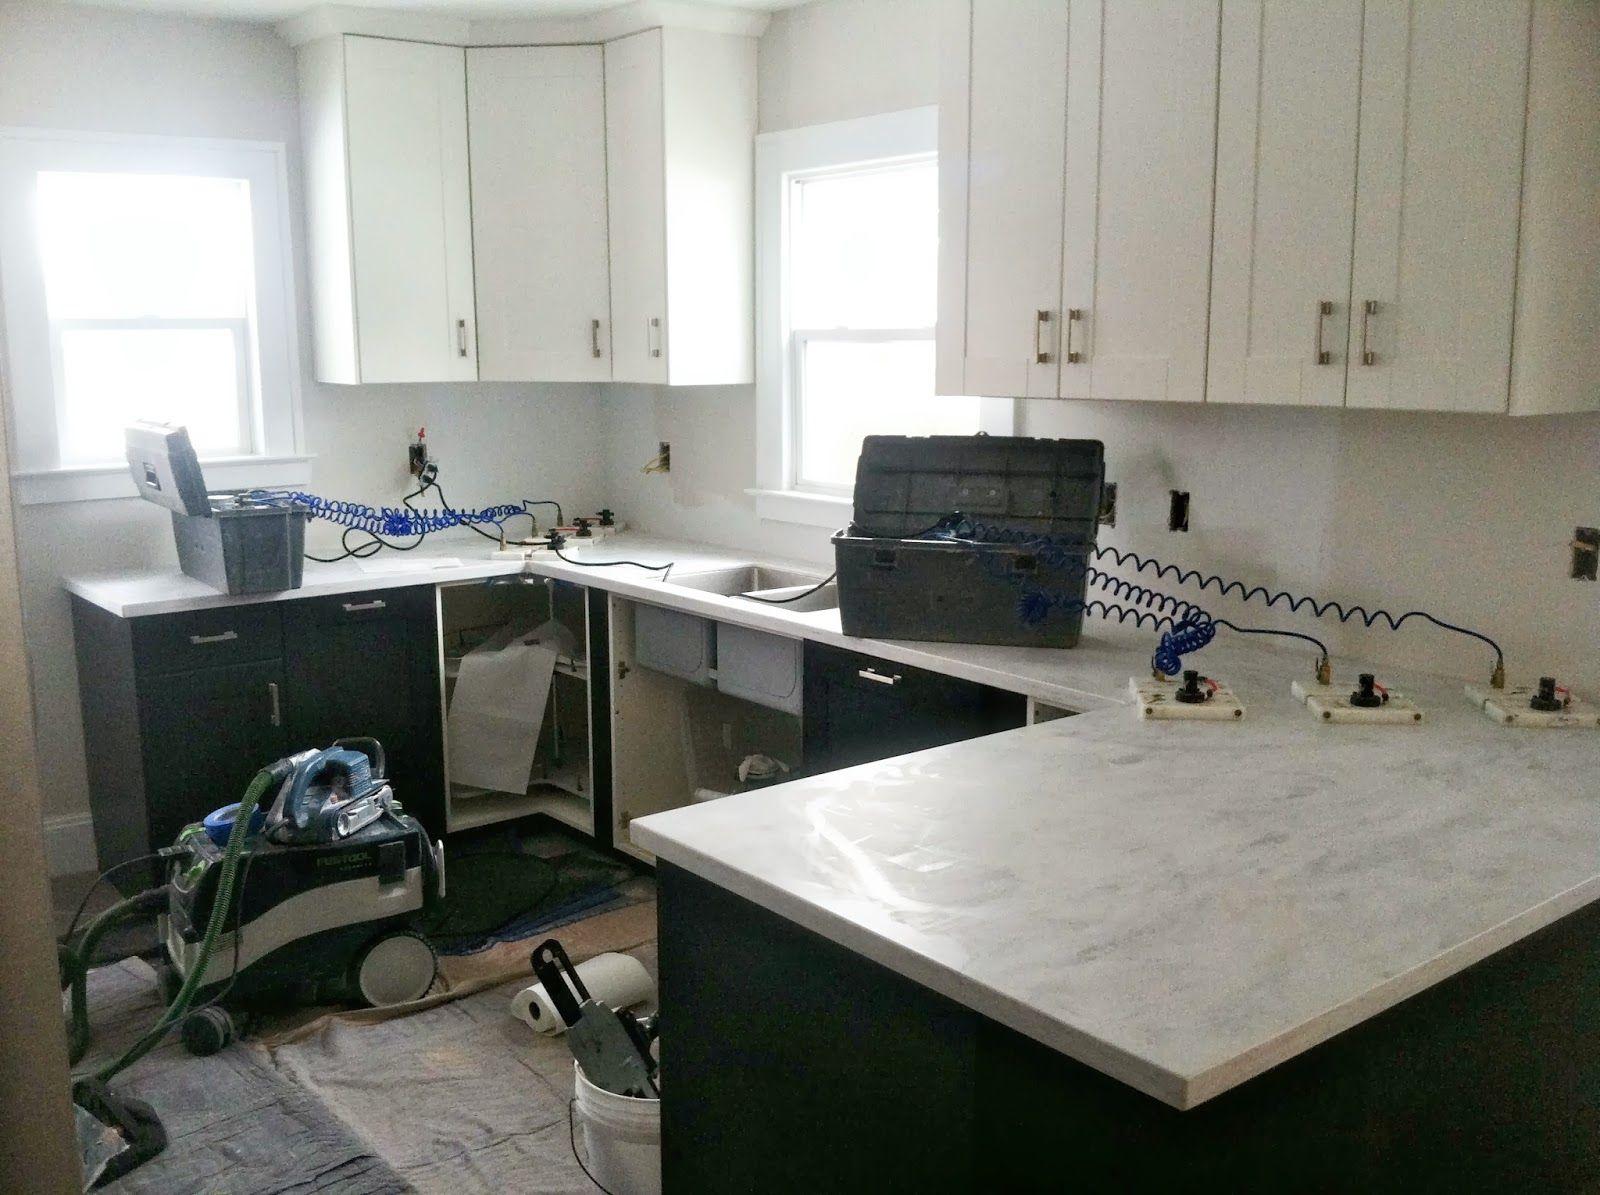 Genial Danks And Honey: Kitchen Renovation | Solid Surface Countertops. Corian  Rain Cloud